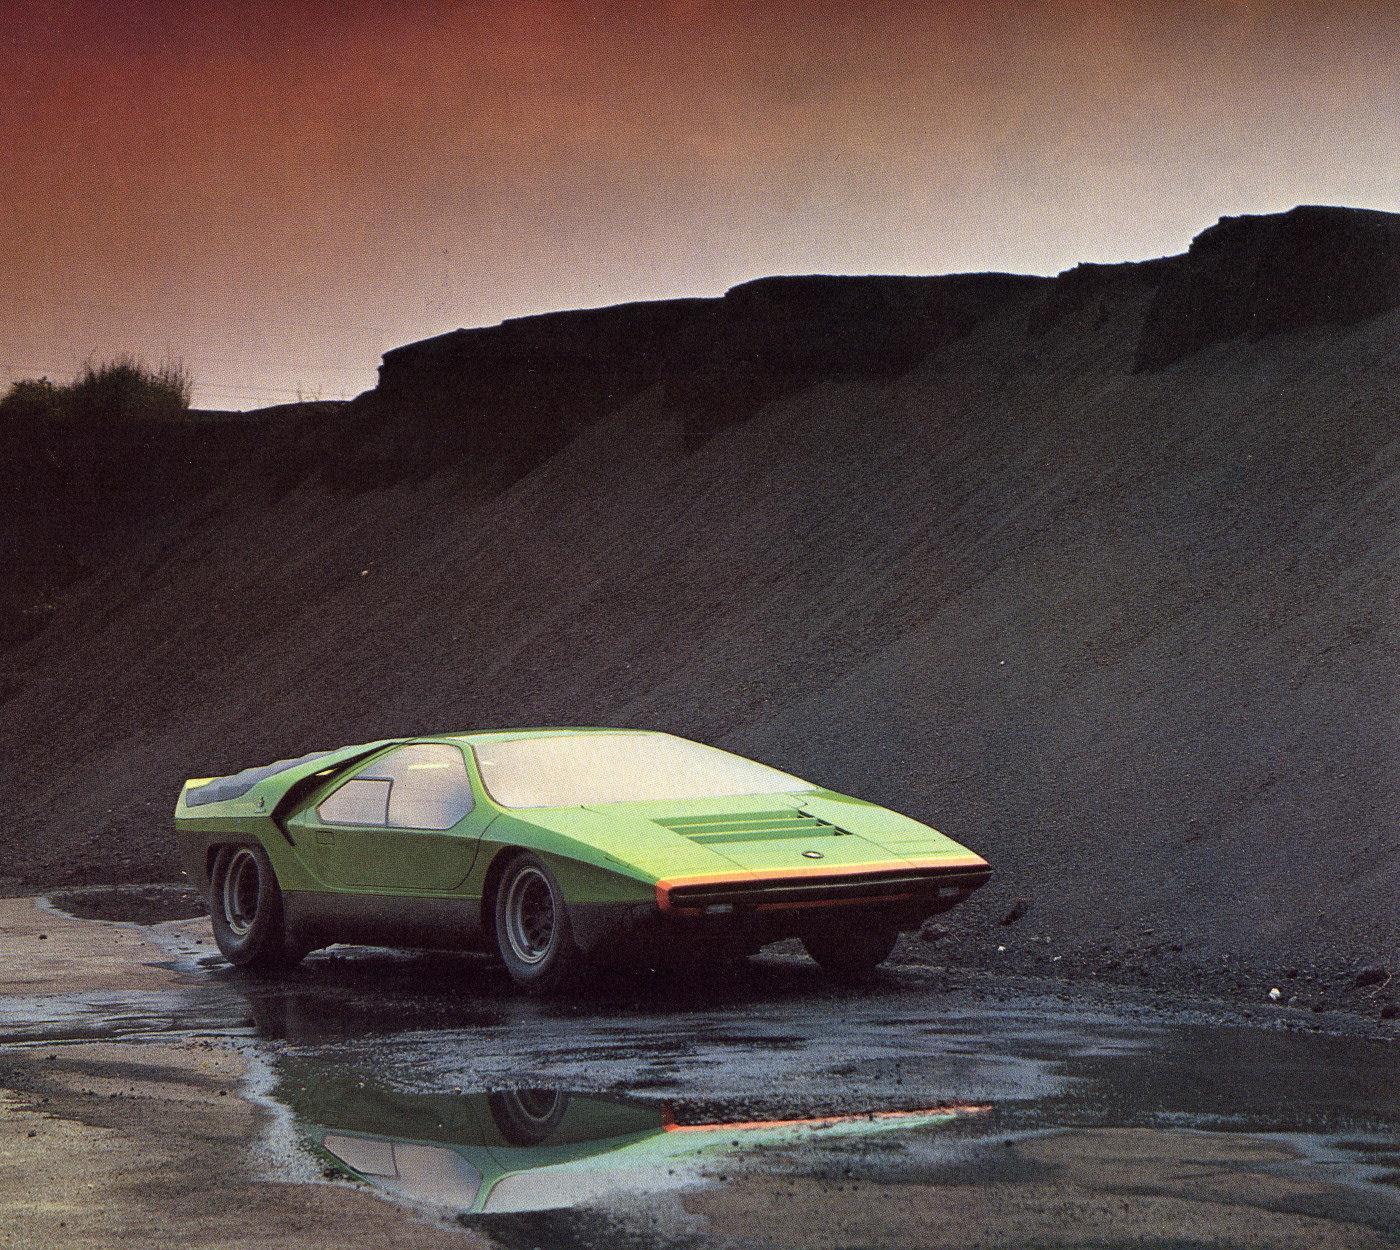 Concept Car Of The Week: Bertone Alfa Romeo Carabo (1968